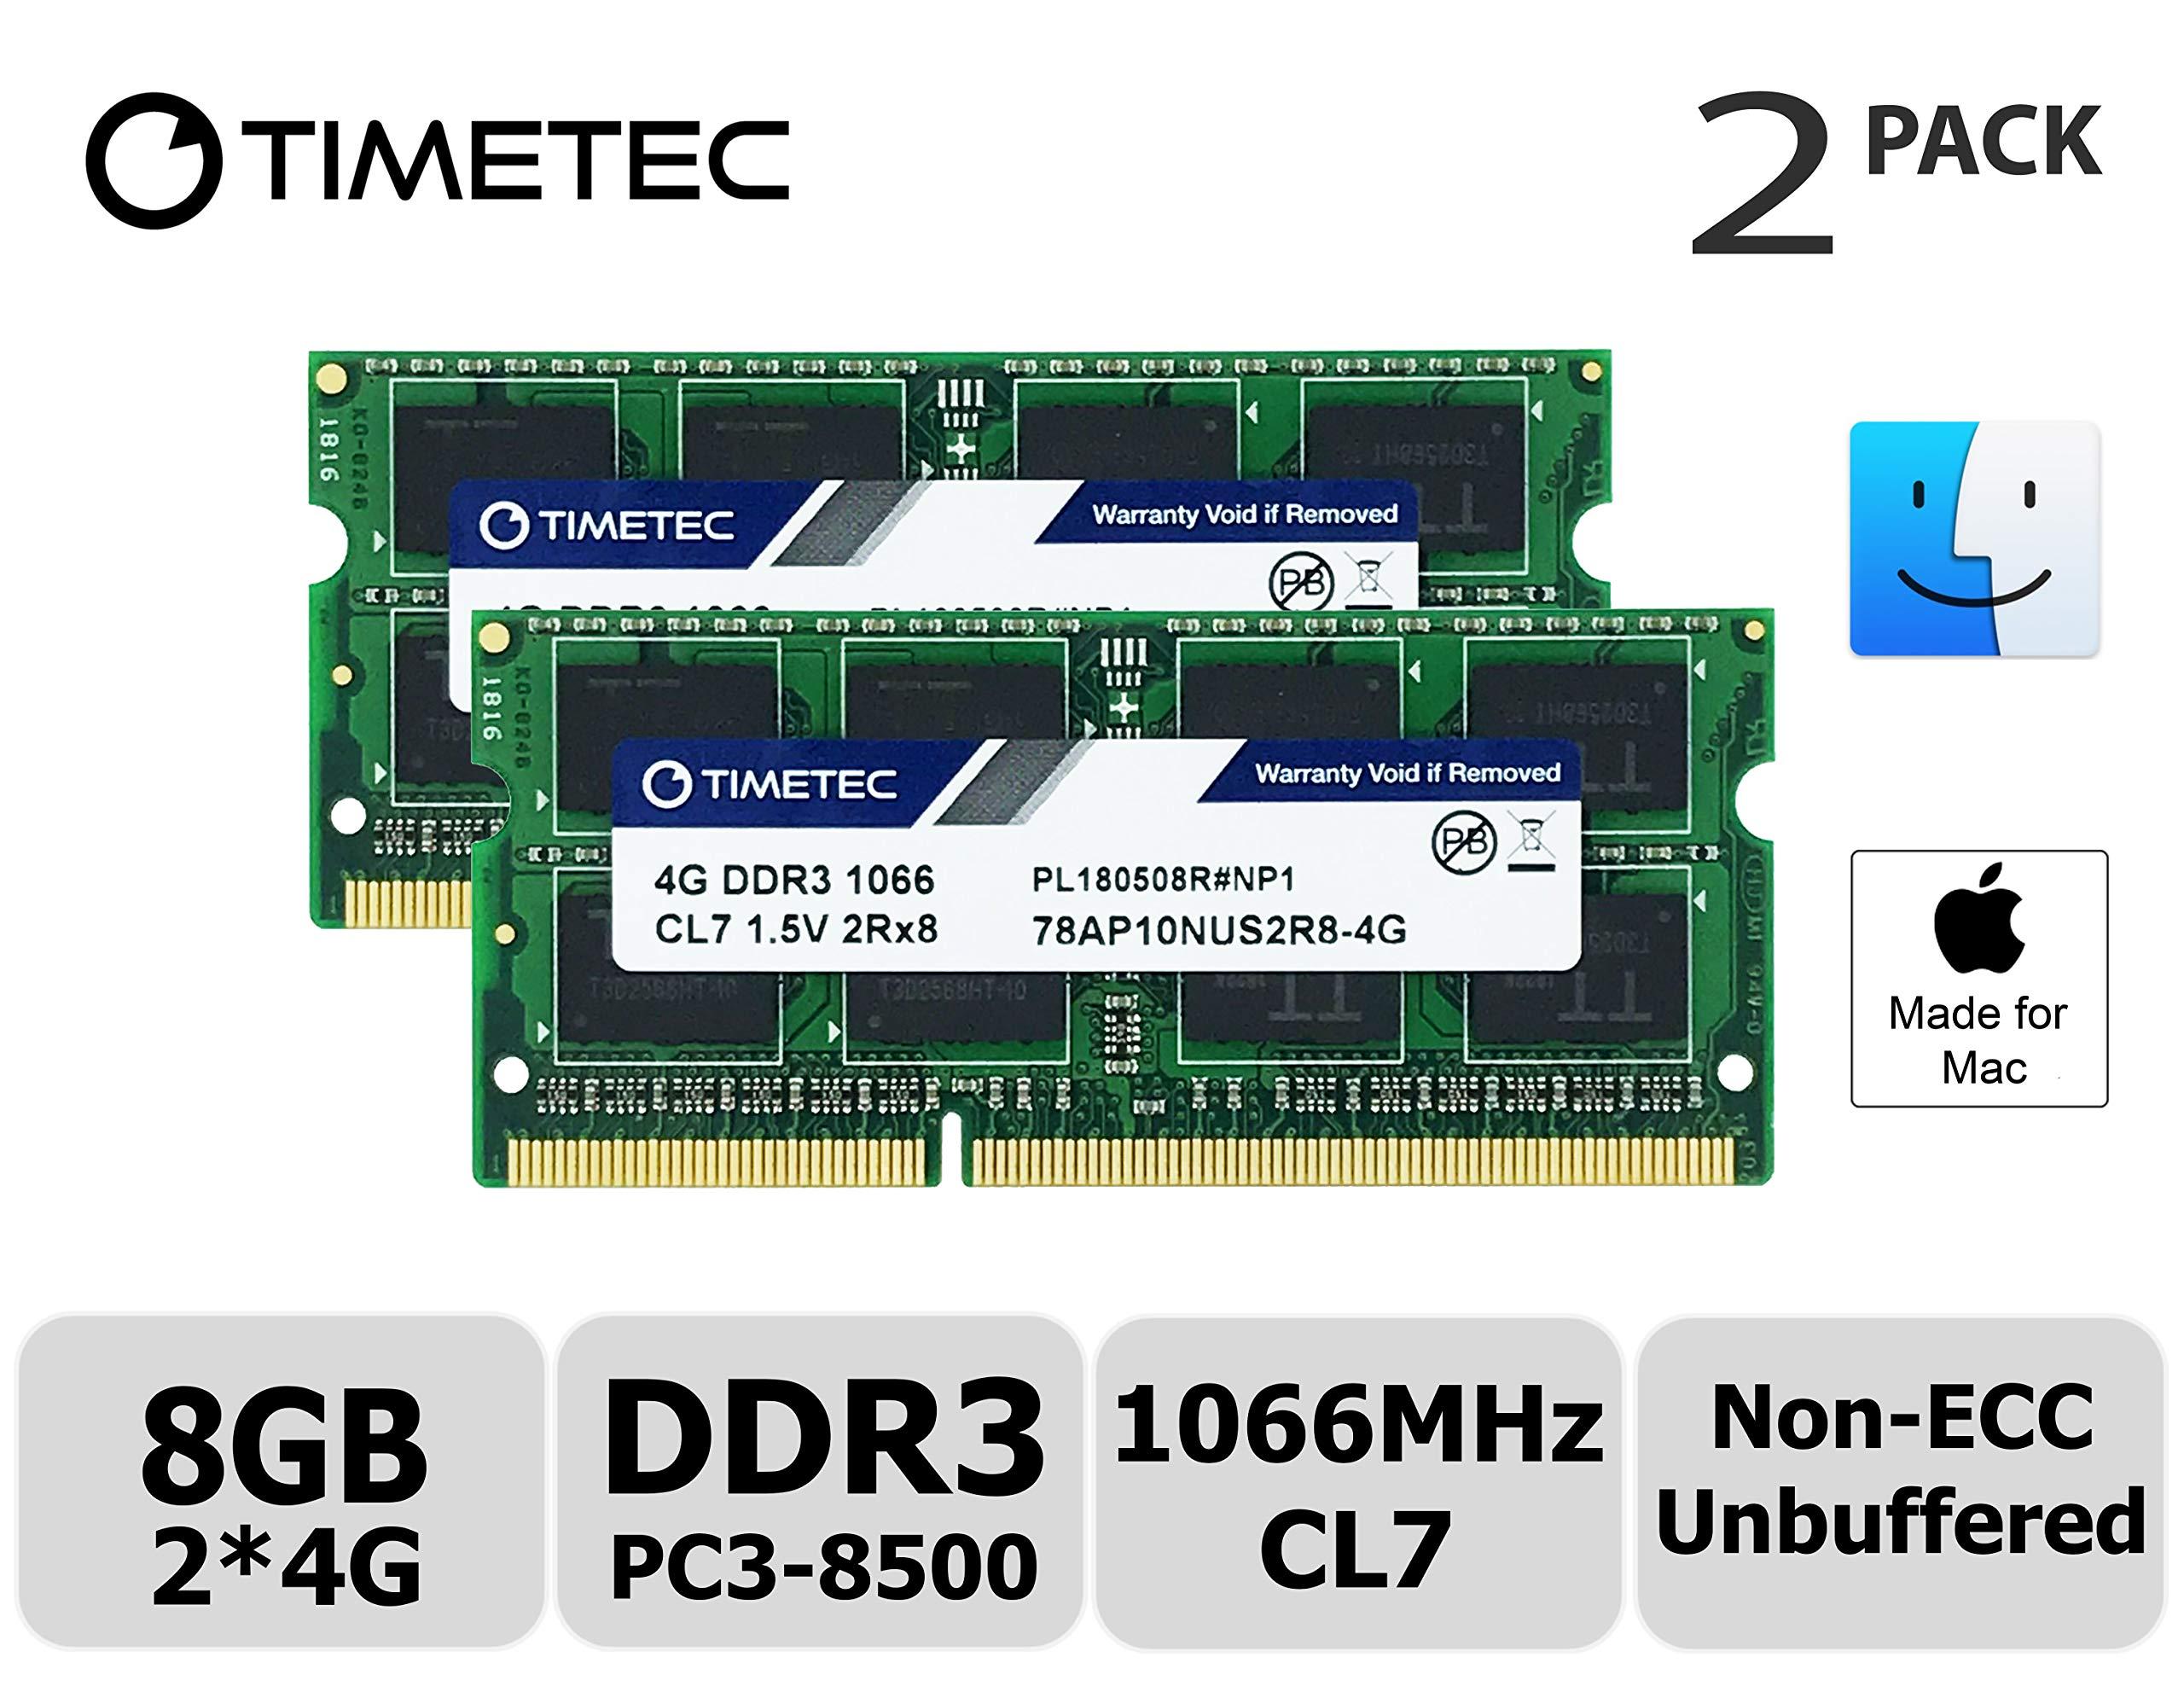 Timetec Hynix IC Apple 8GB Kit (2x4GB) DDR3 PC3-8500 1066MHz memory upgrade for iMac 21.5 inch/27 inch/20 inch/24 inch, MacBook Pro 13 inch/15 inch/17 inch, Mac mini 2009 2010 (8GB Kit (2x4GB))